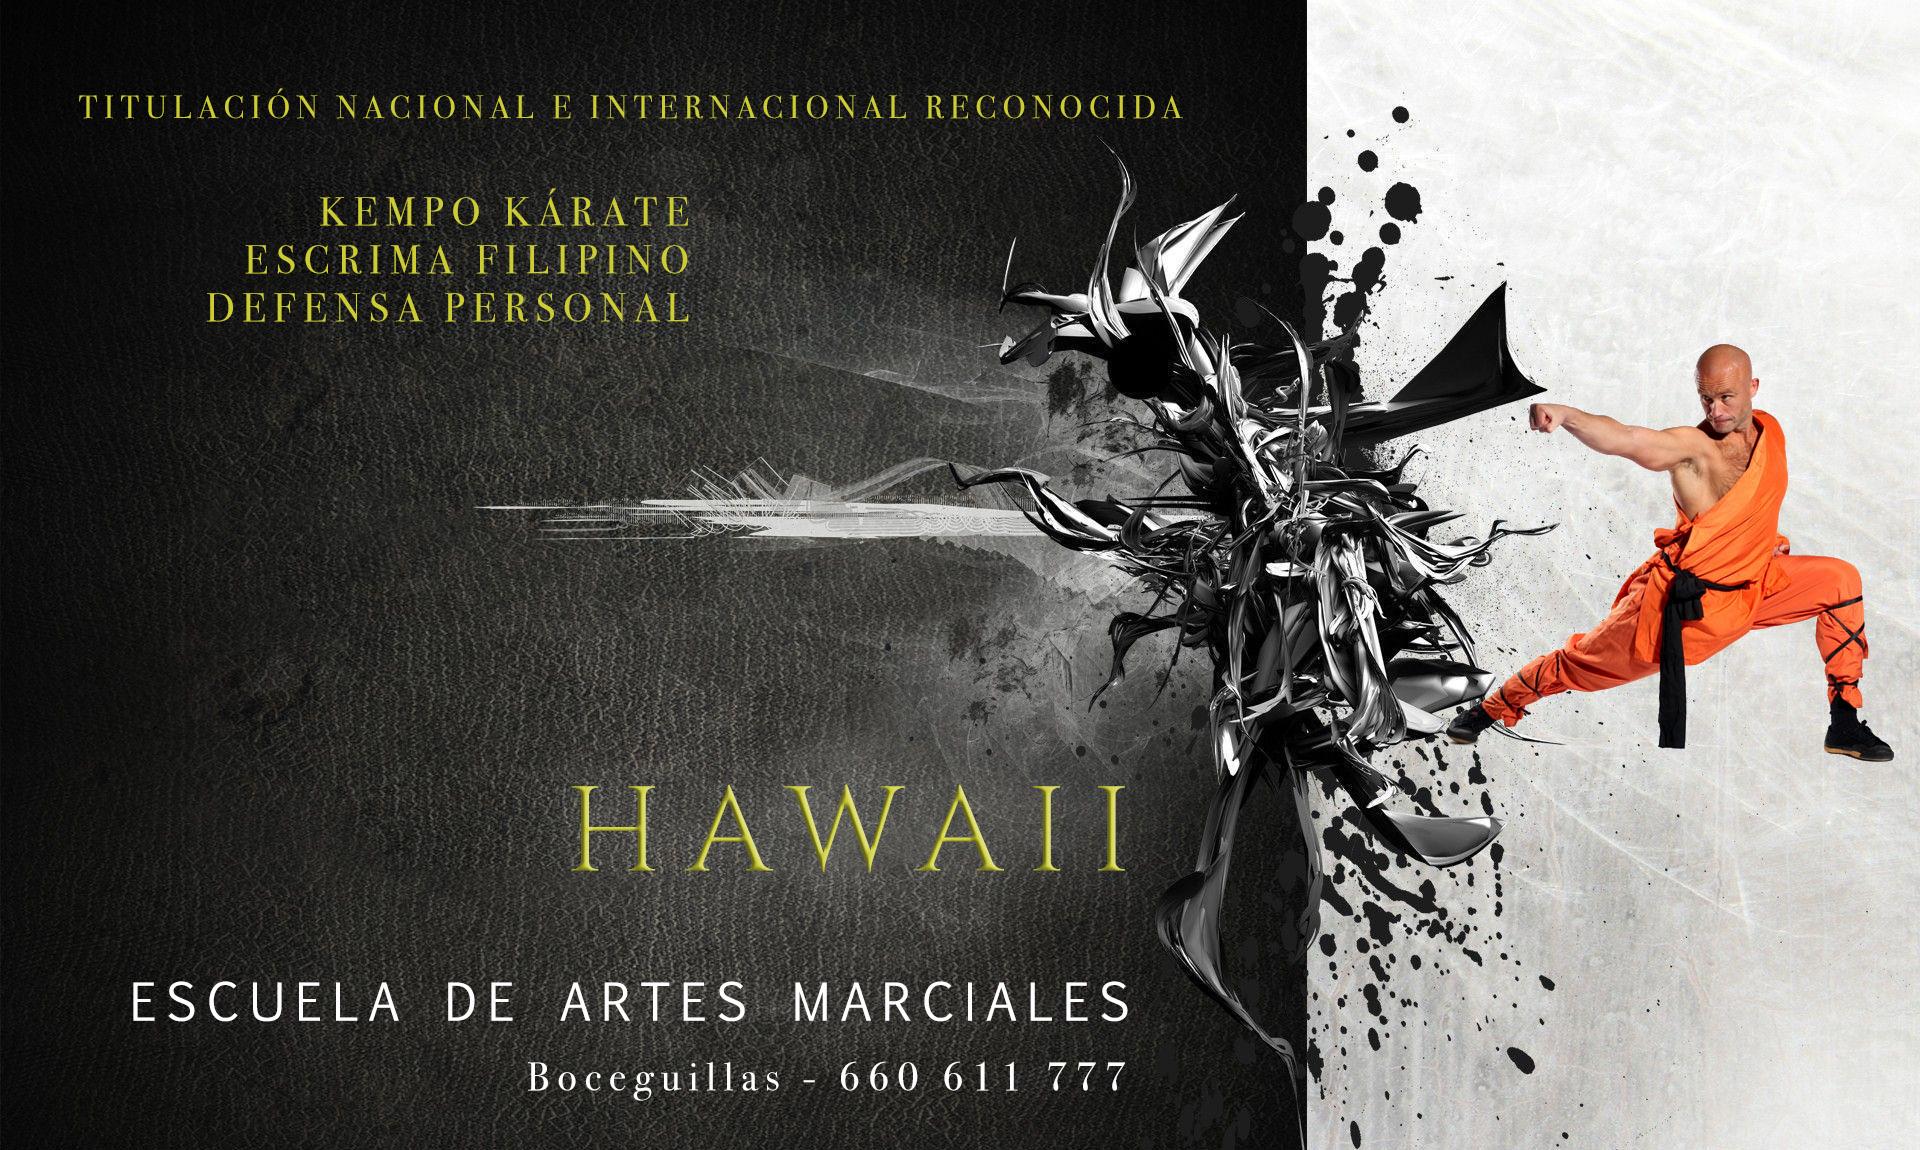 Hawaii-Artes-Marciales-1b